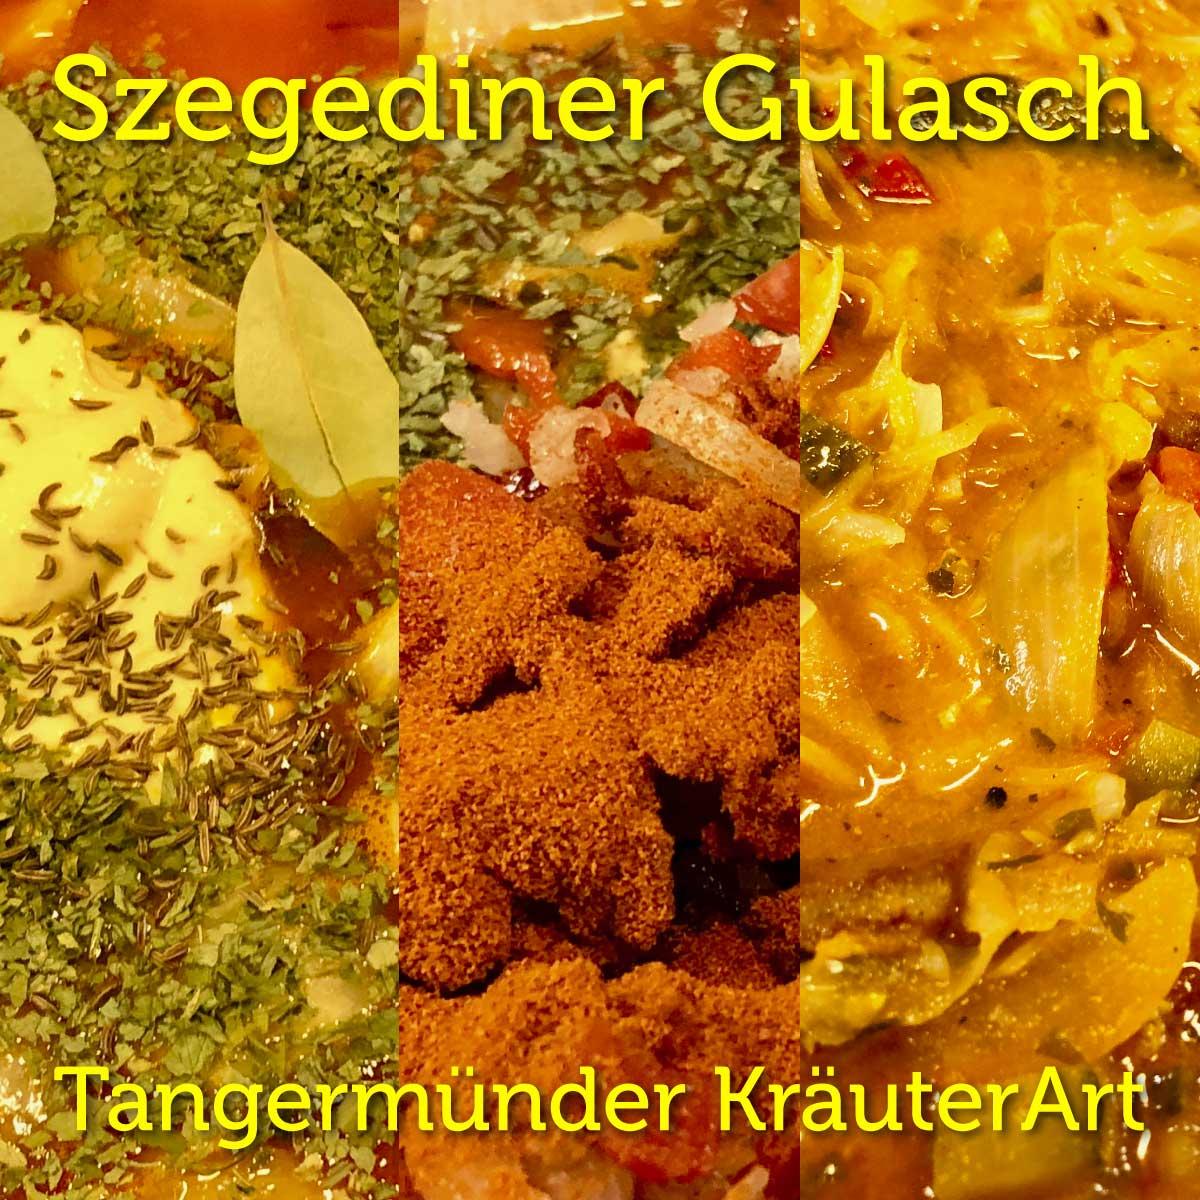 Rezept, Szegediner Gulasch, Tangermünder KräuterArt, mit fermentiertem Sauerkraut, selbstgemacht, vegan, vegetarisch,